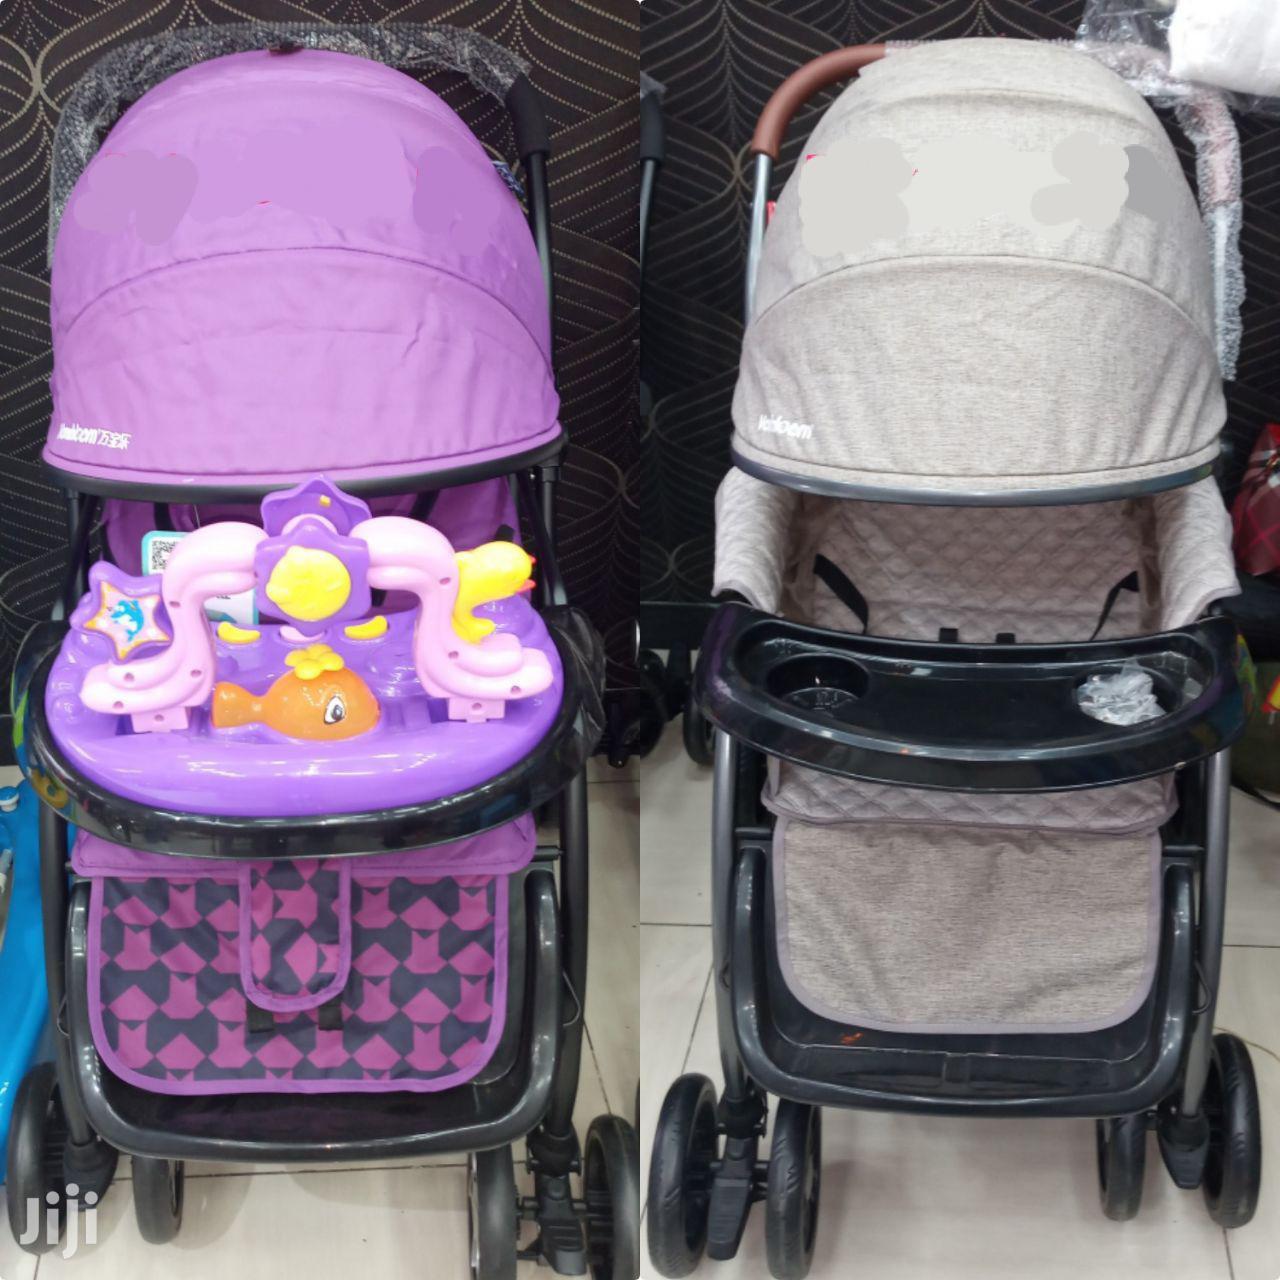 Archive: Baby Stroller የህፃናት ማንሸራሸሪያ ጋሪ